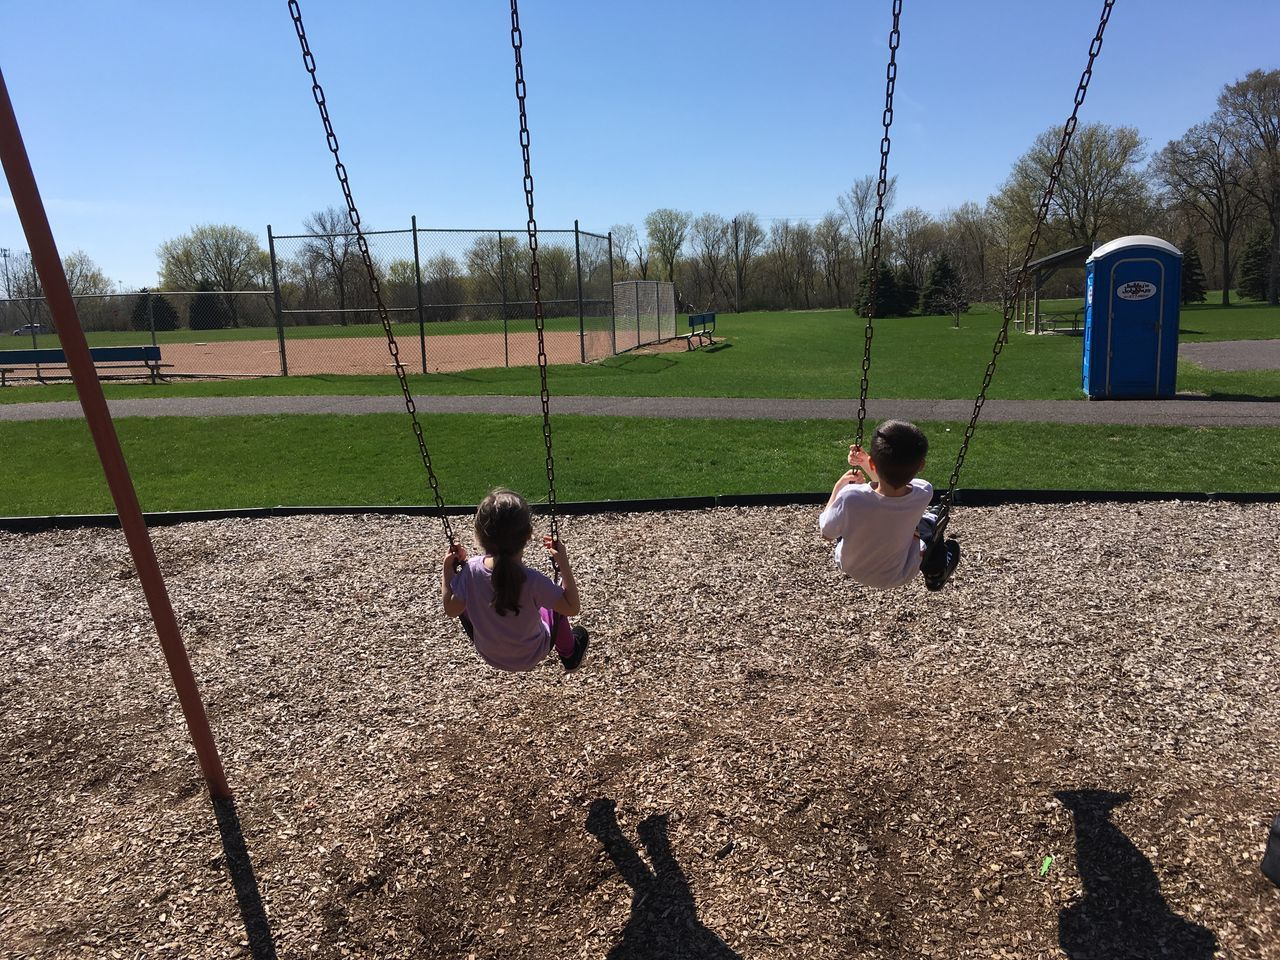 Kids On Swing Swinging Swings Playground Park Playtime Sunny Day Blue Toilet Green Grass Baseball Field Kids Boy Girl Children Playing